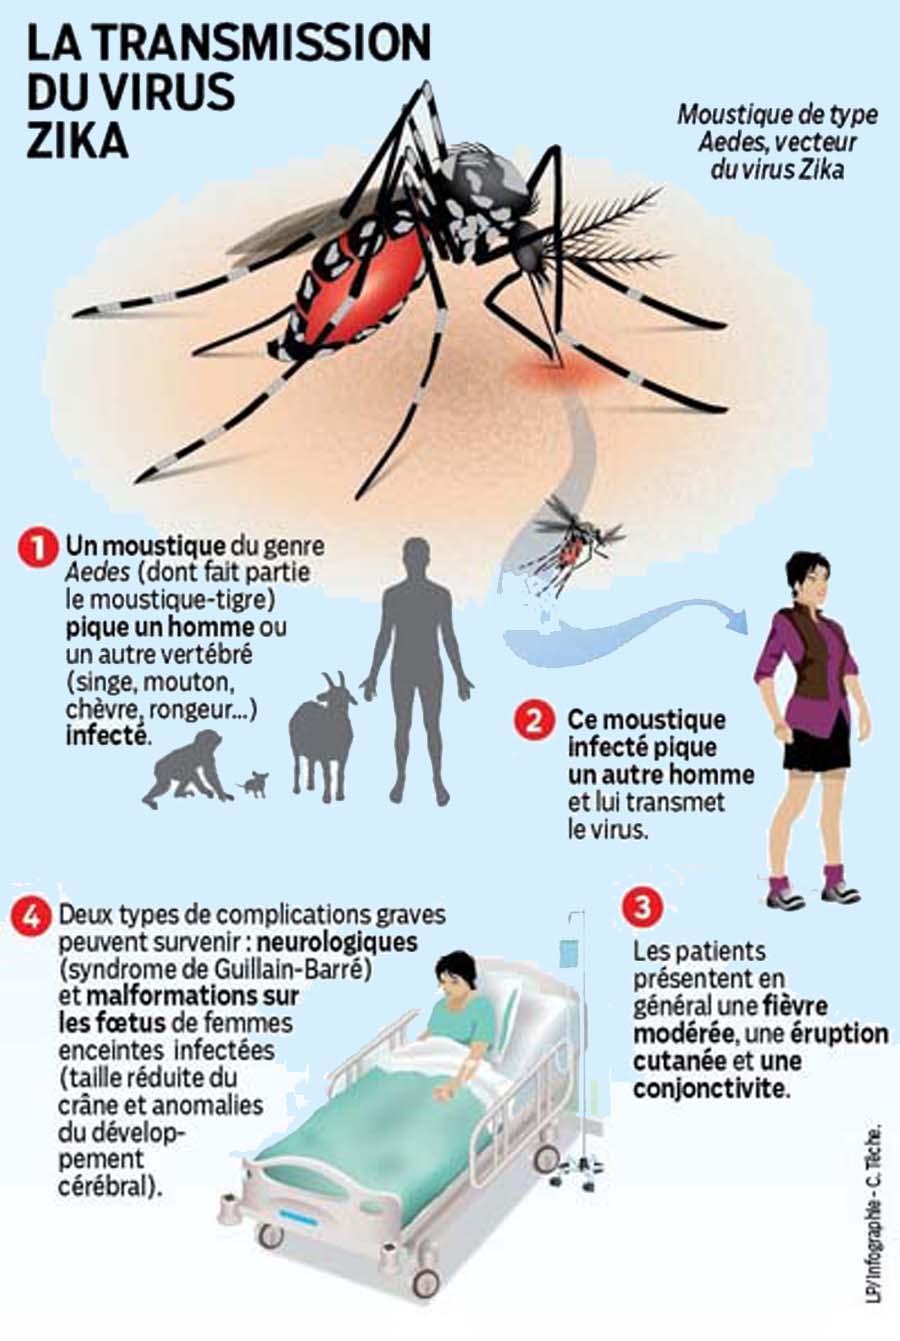 transmission_zika